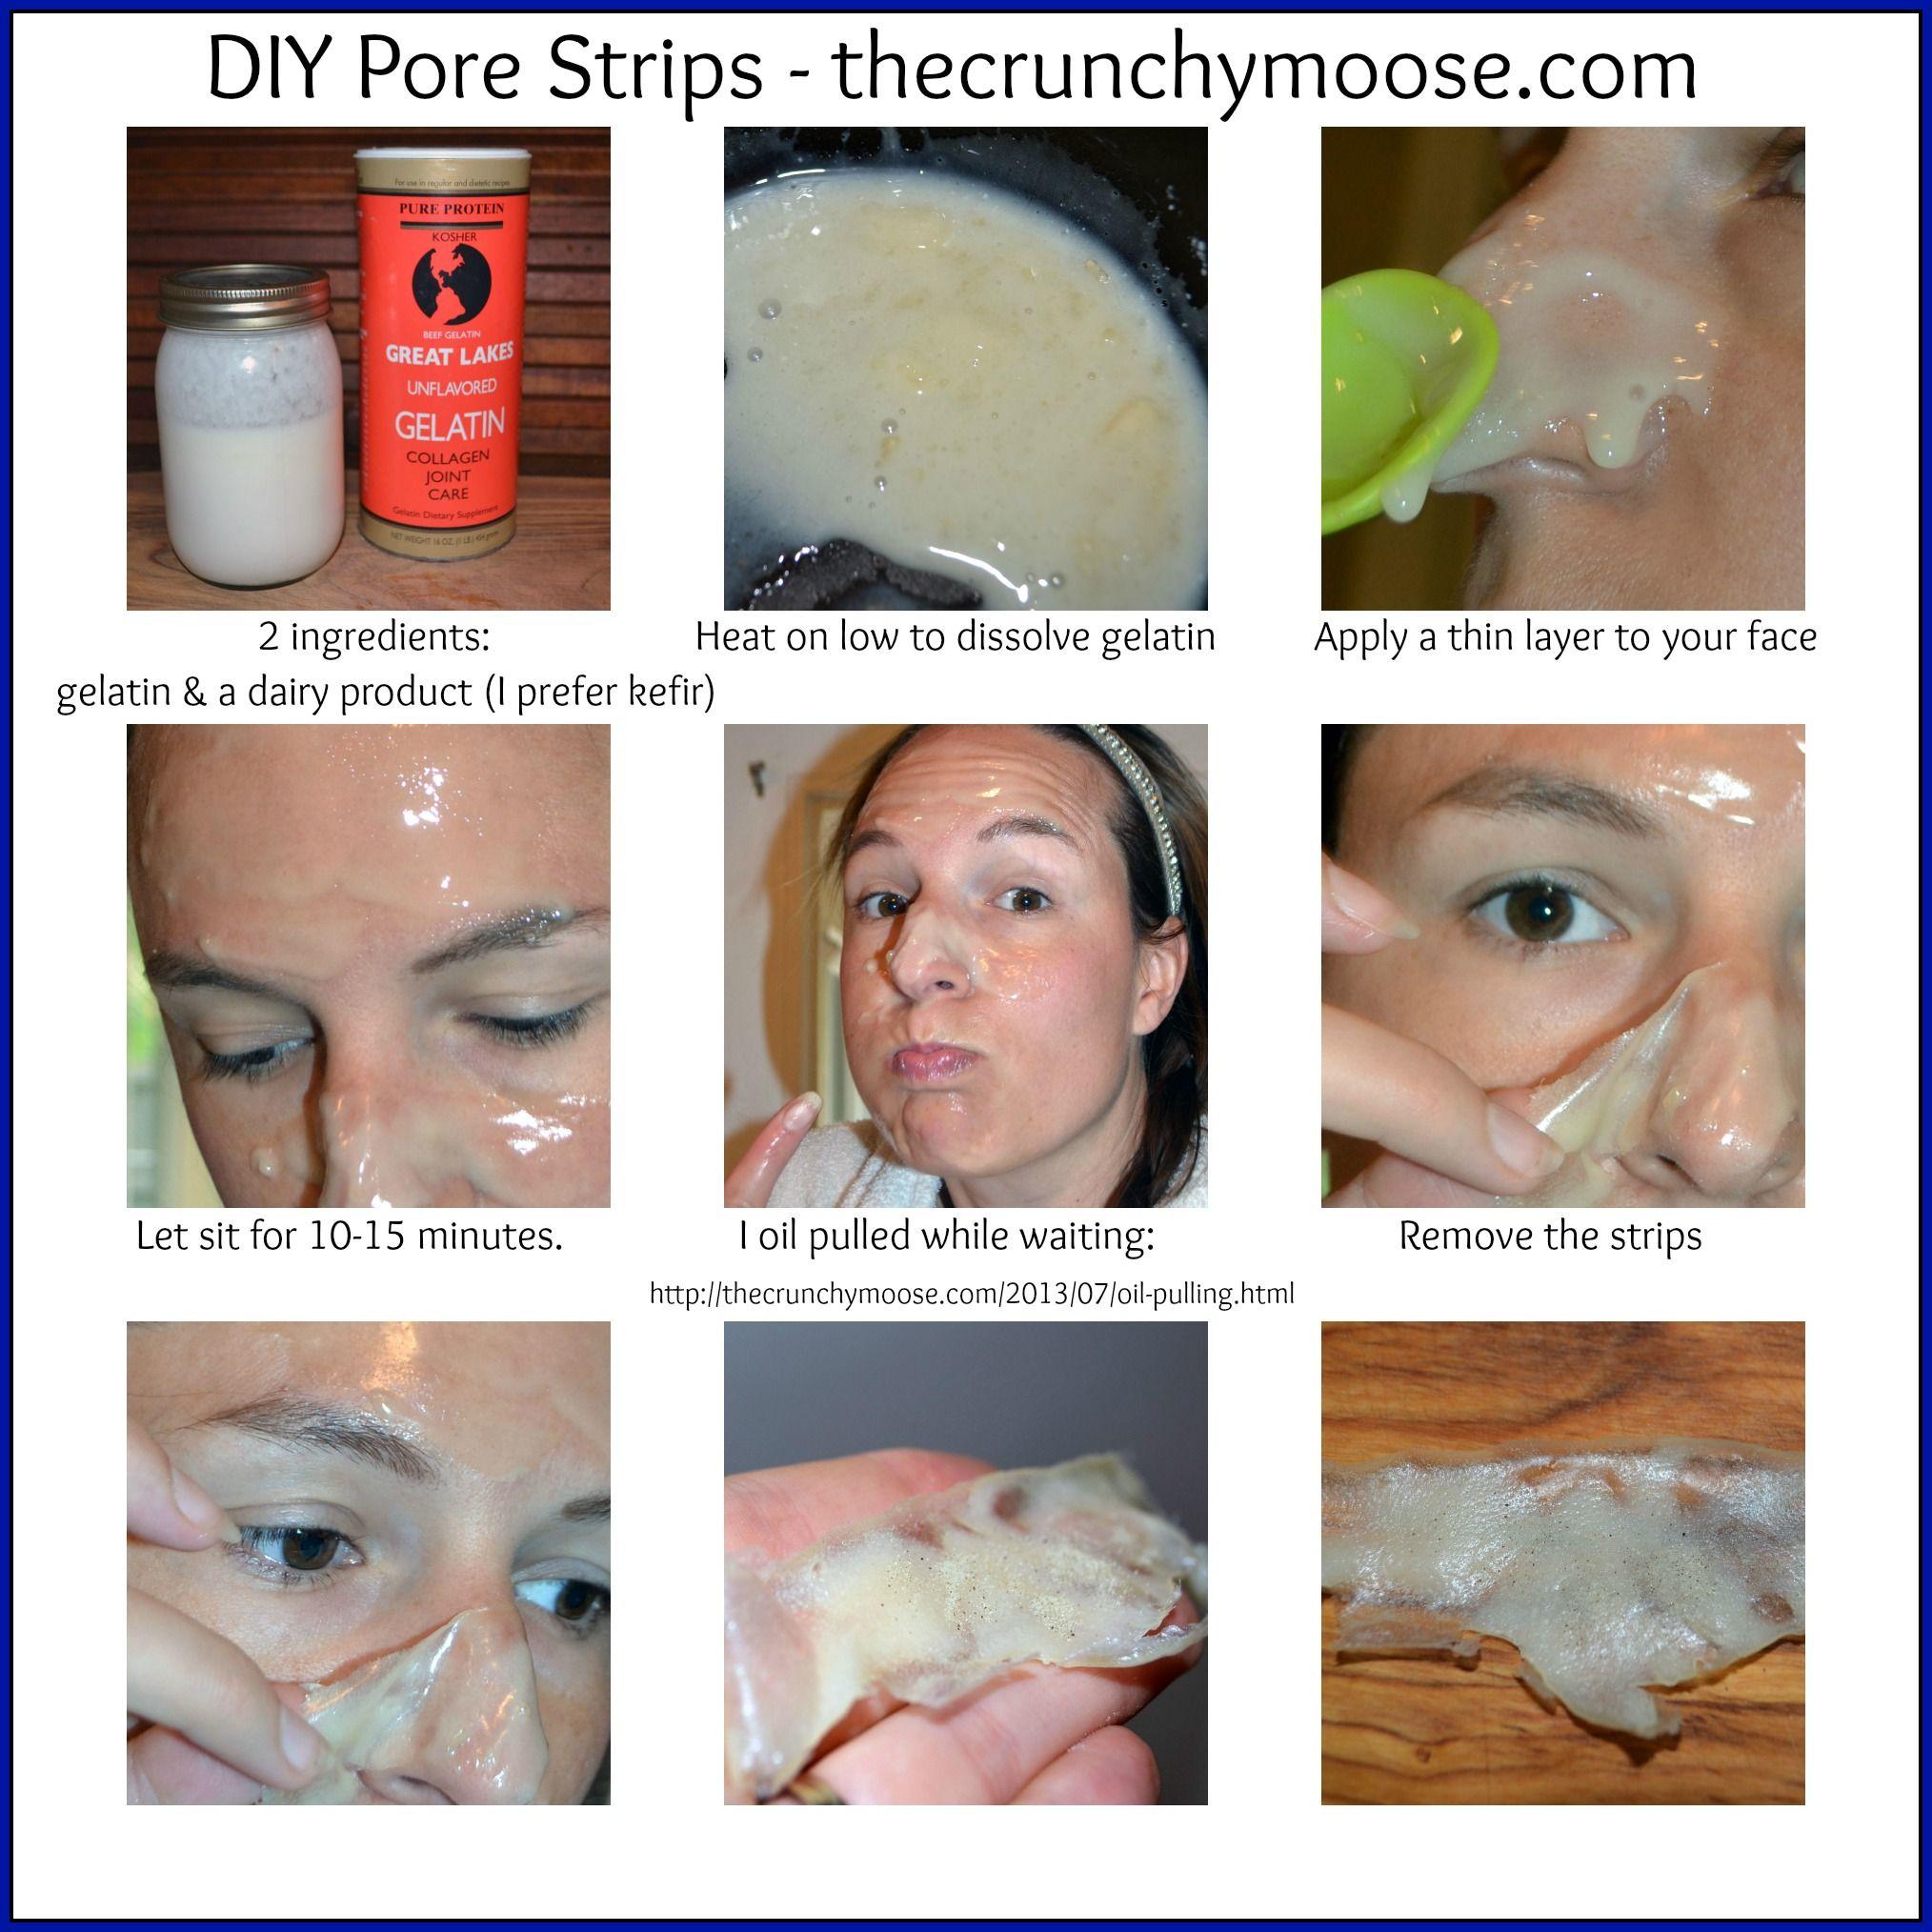 DIY Pore Strips To Remove Blackheads